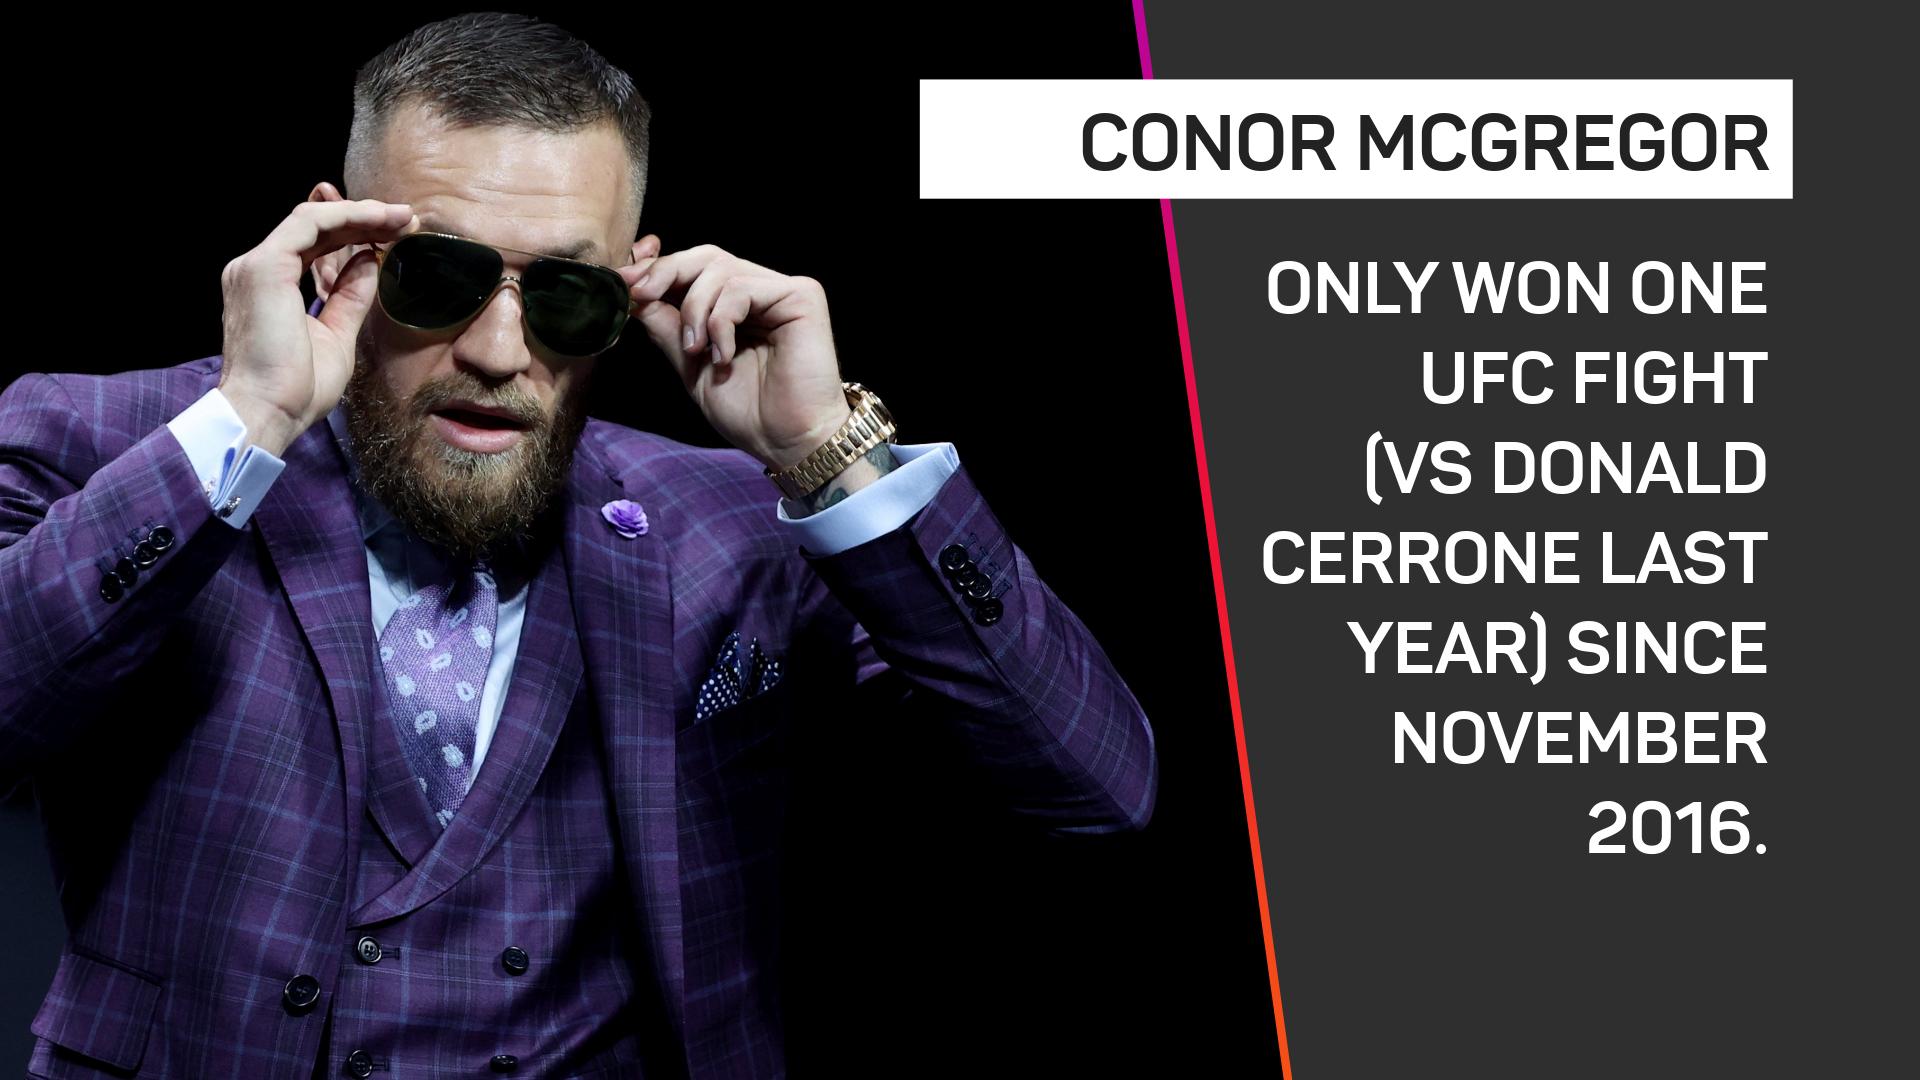 Conor McGregor has one win in five years